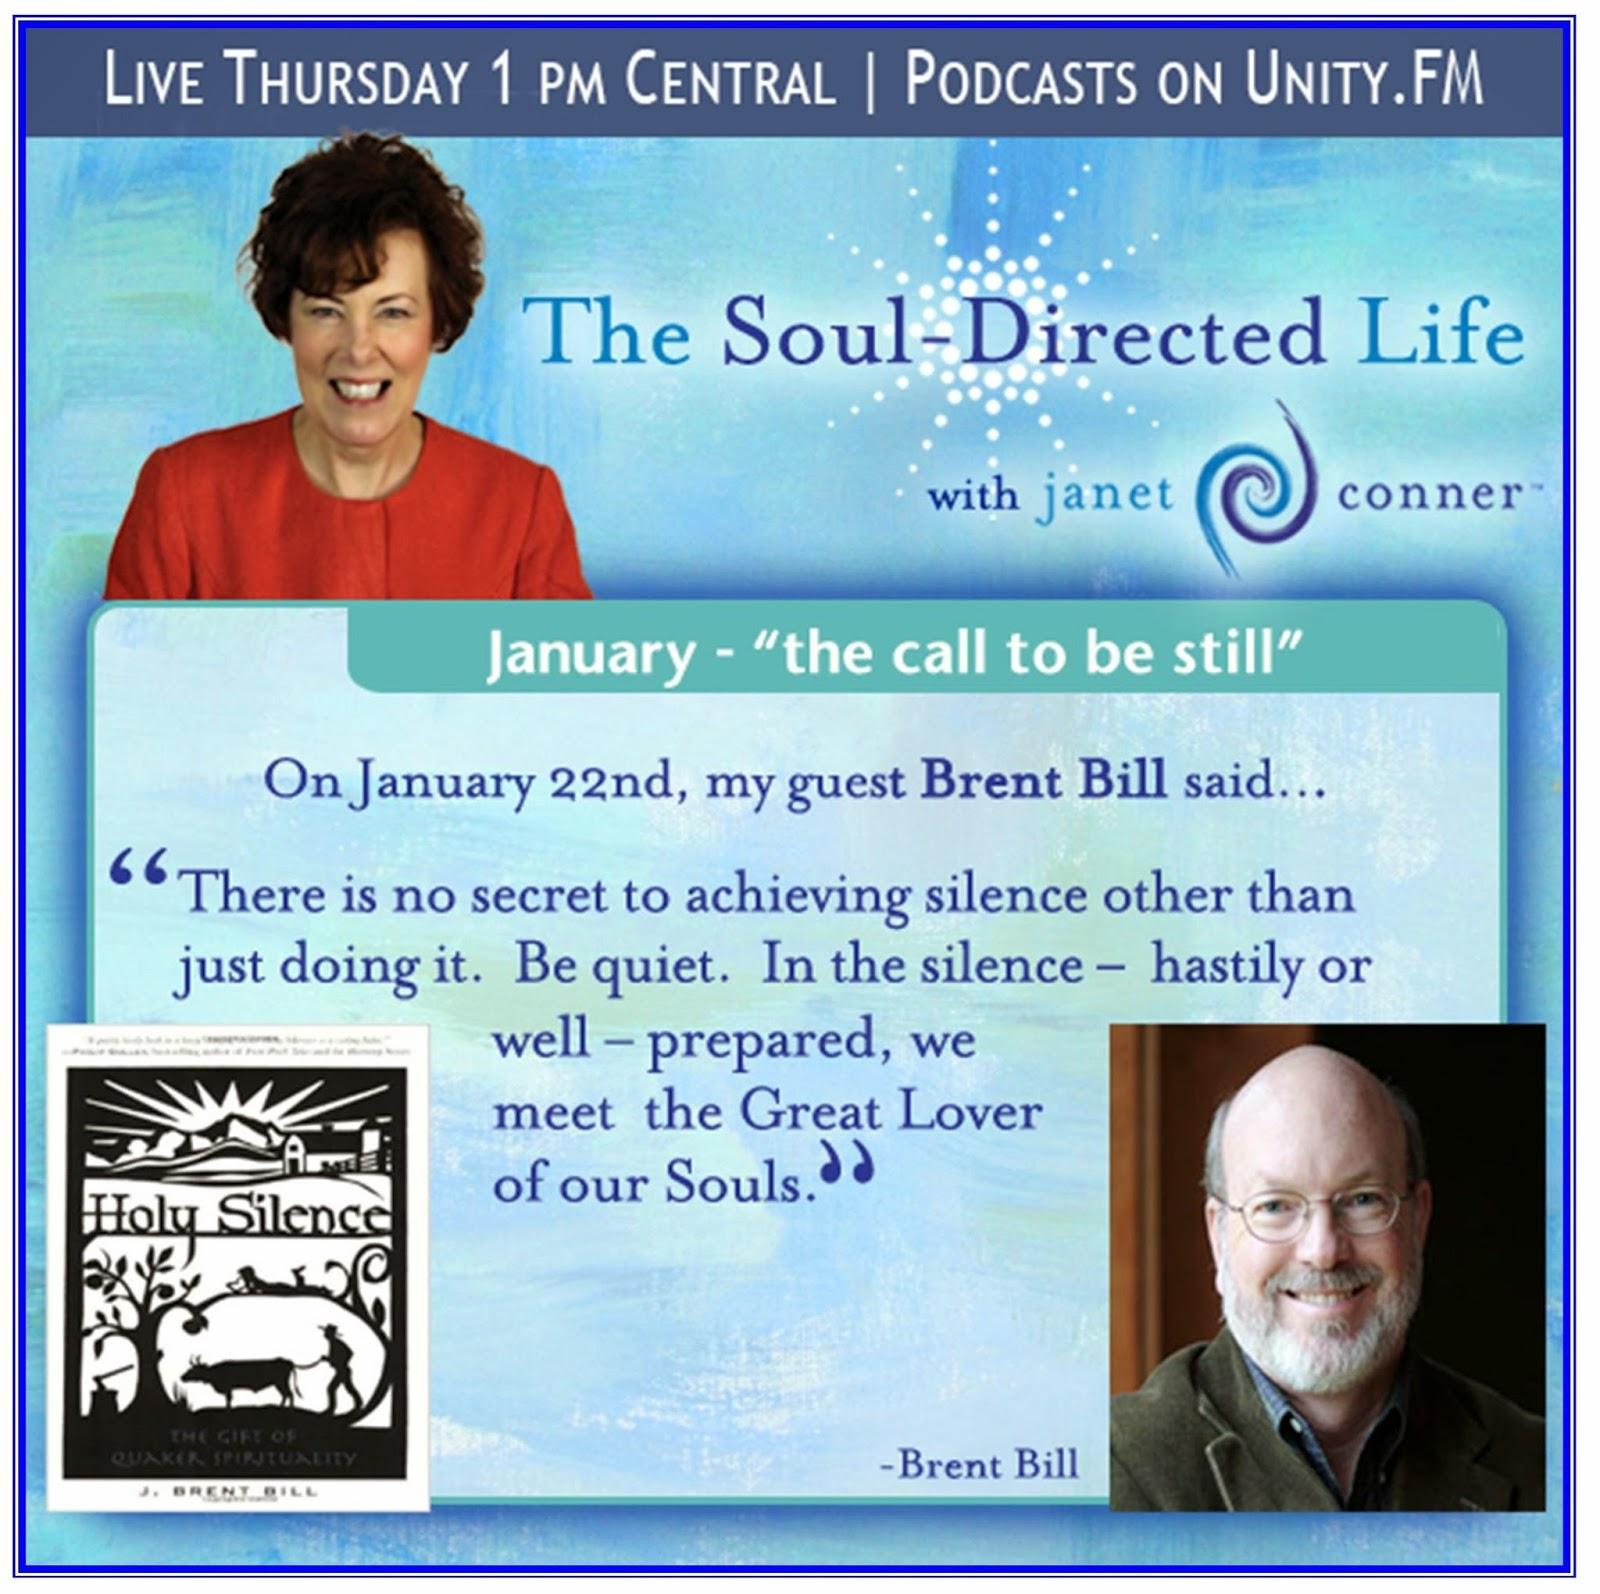 ... To listen, vist http://www.unity.fm/episode/TheSoulDirectedLife_012215